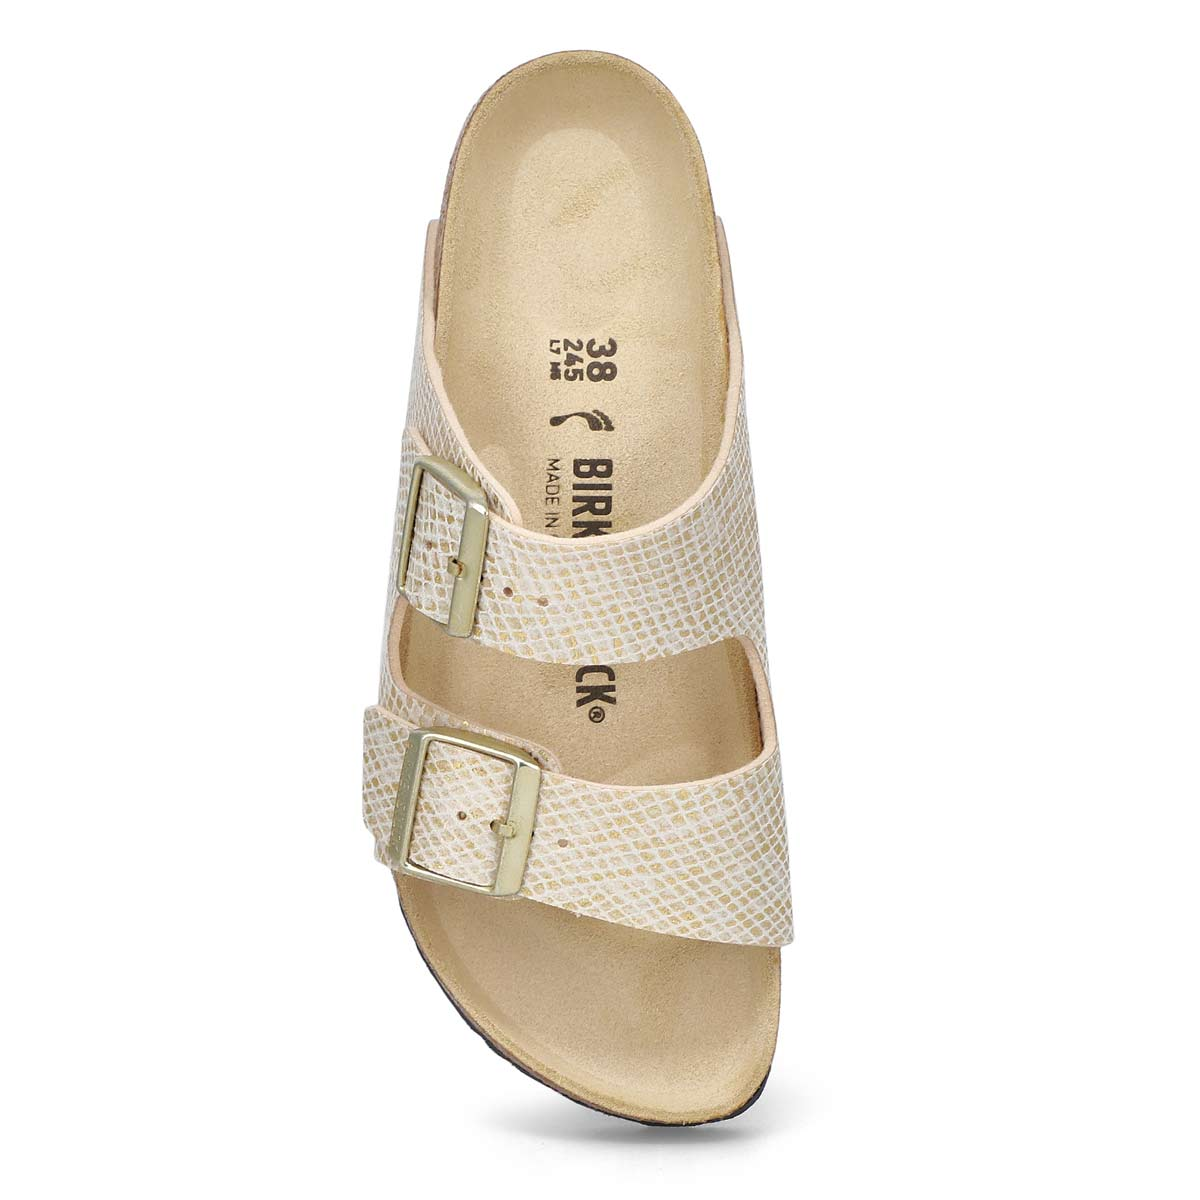 Women's Arizona Narrow Sandal-Python Eggshell/Gold